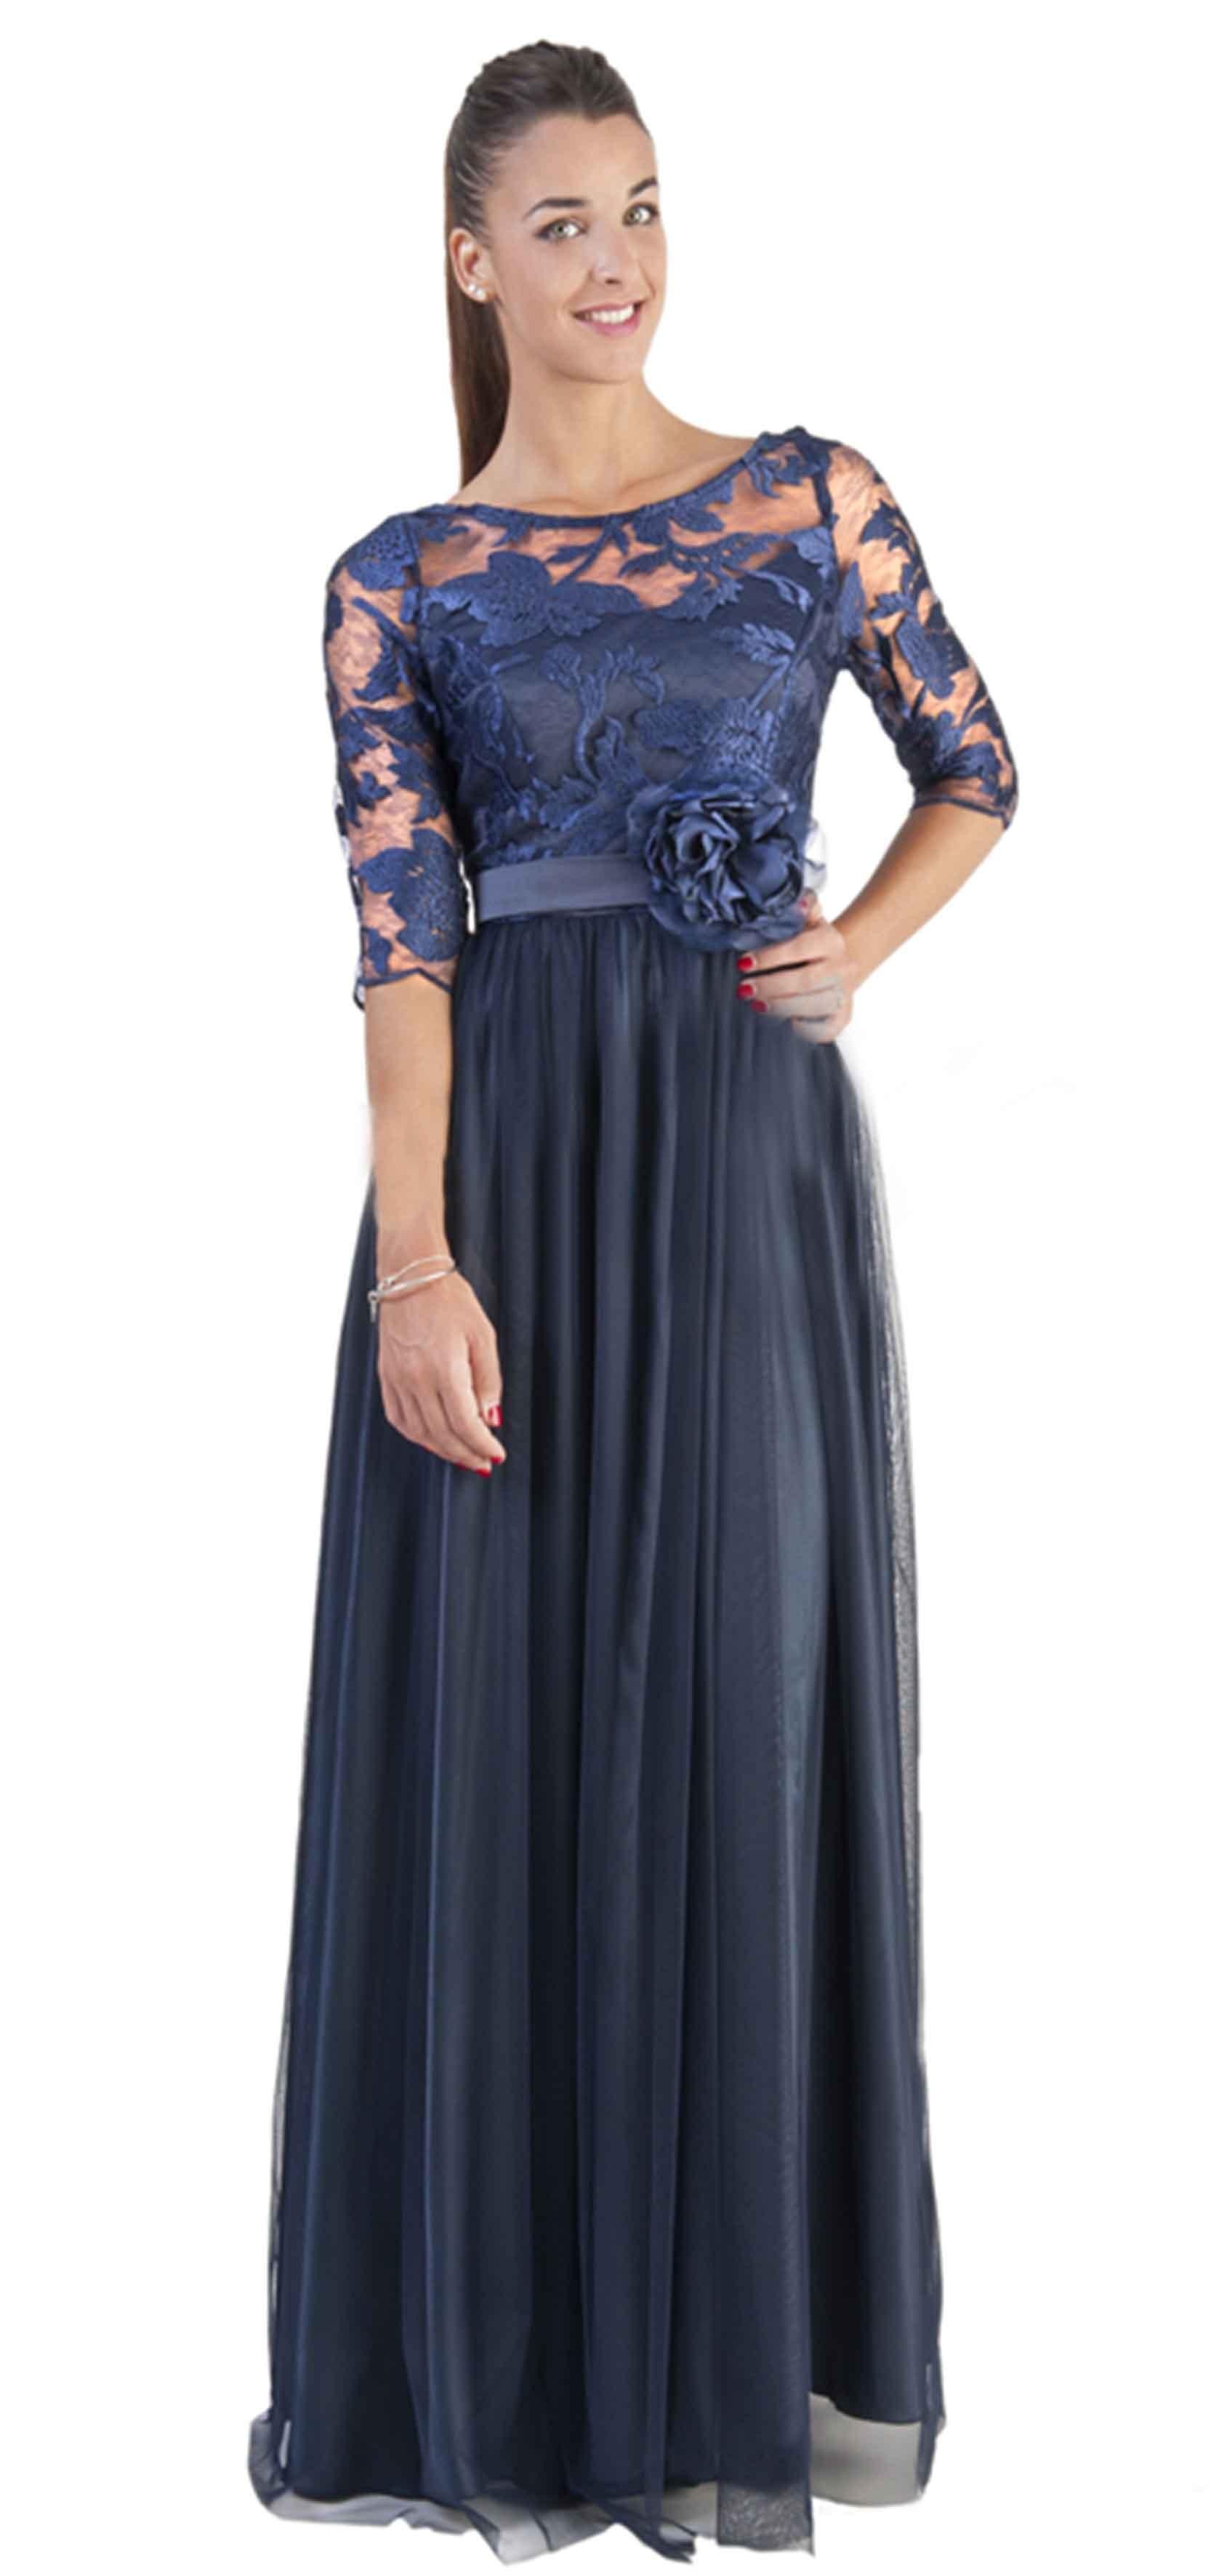 Vestido de blonda azul marino